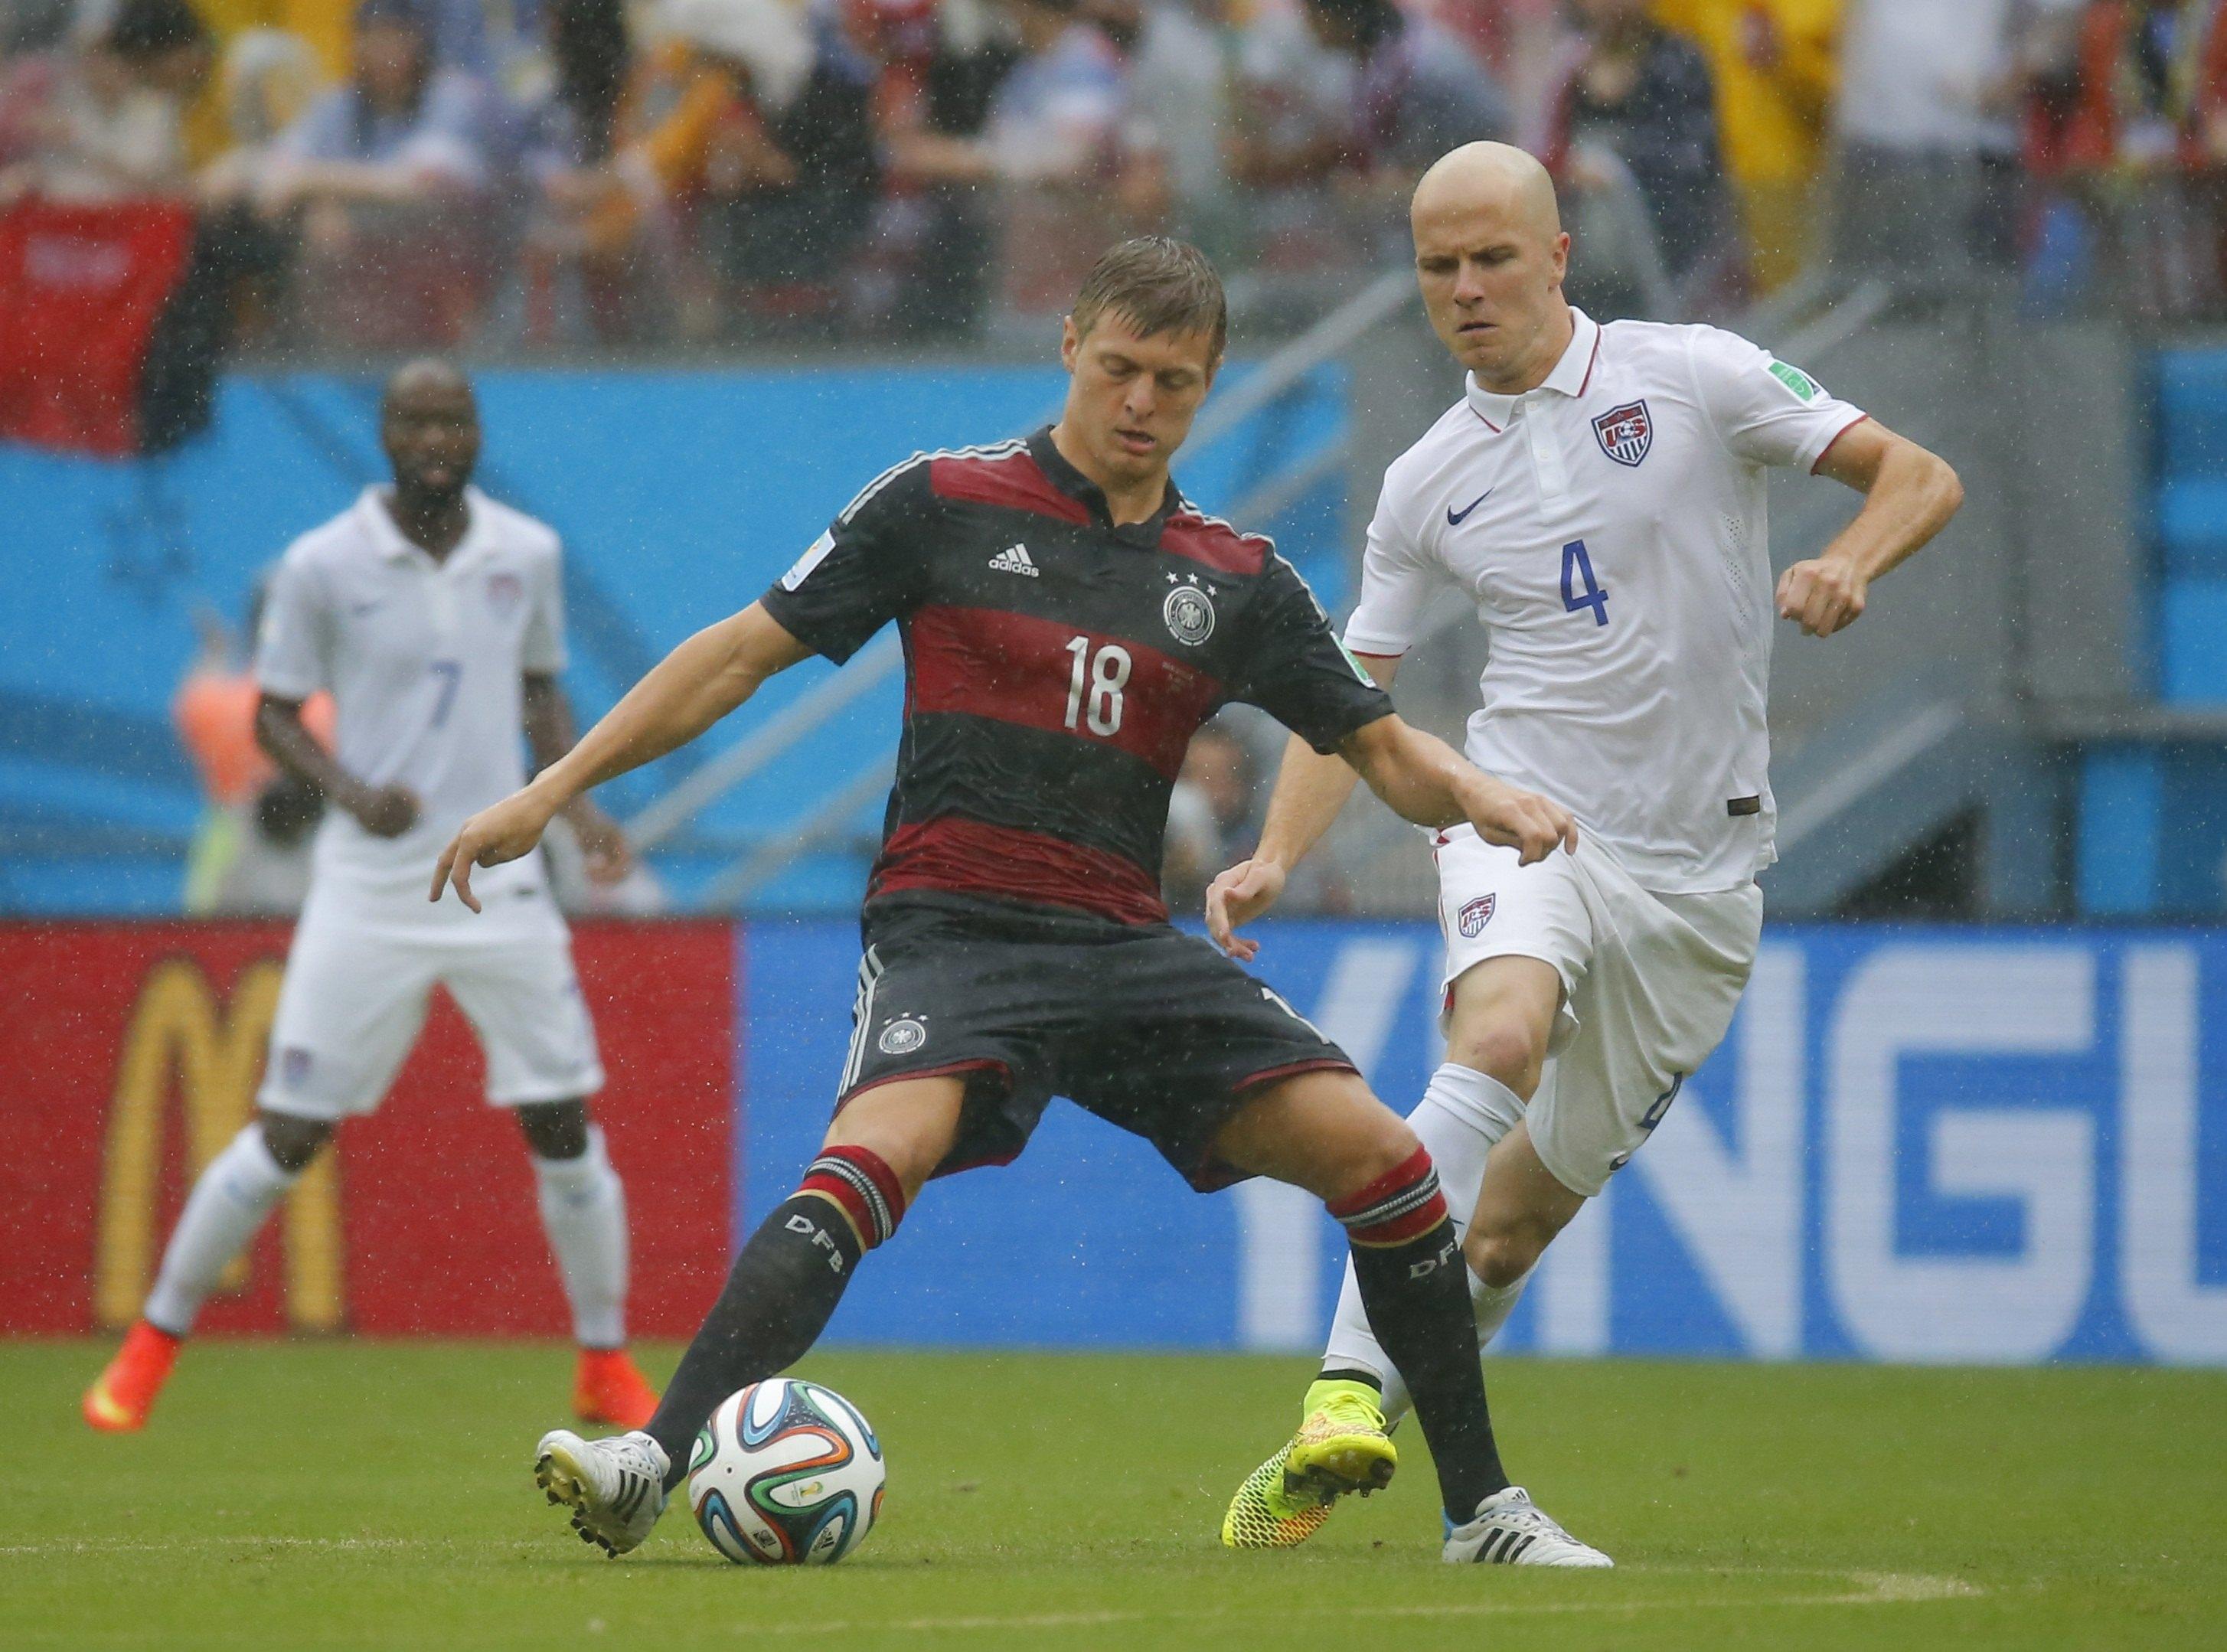 2014 FIFA World Cup: USA advances despite 0-1 loss to Germany